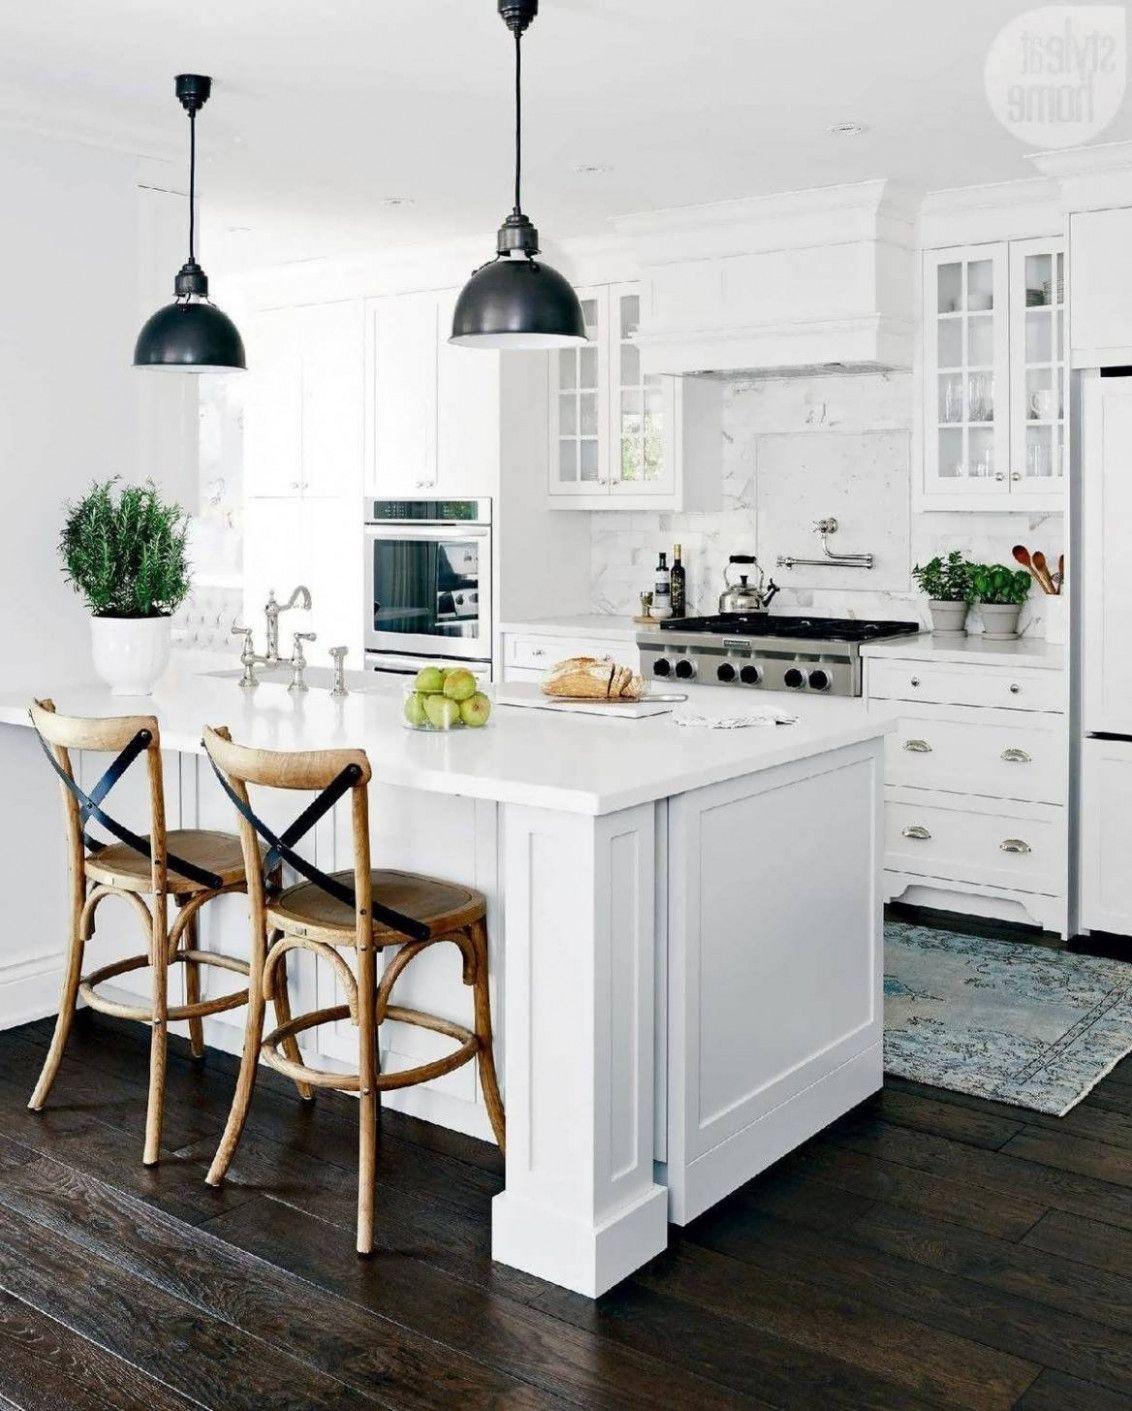 Period Kitchens Designs Renovation: Kitchen Cabinet Remodel, Modern